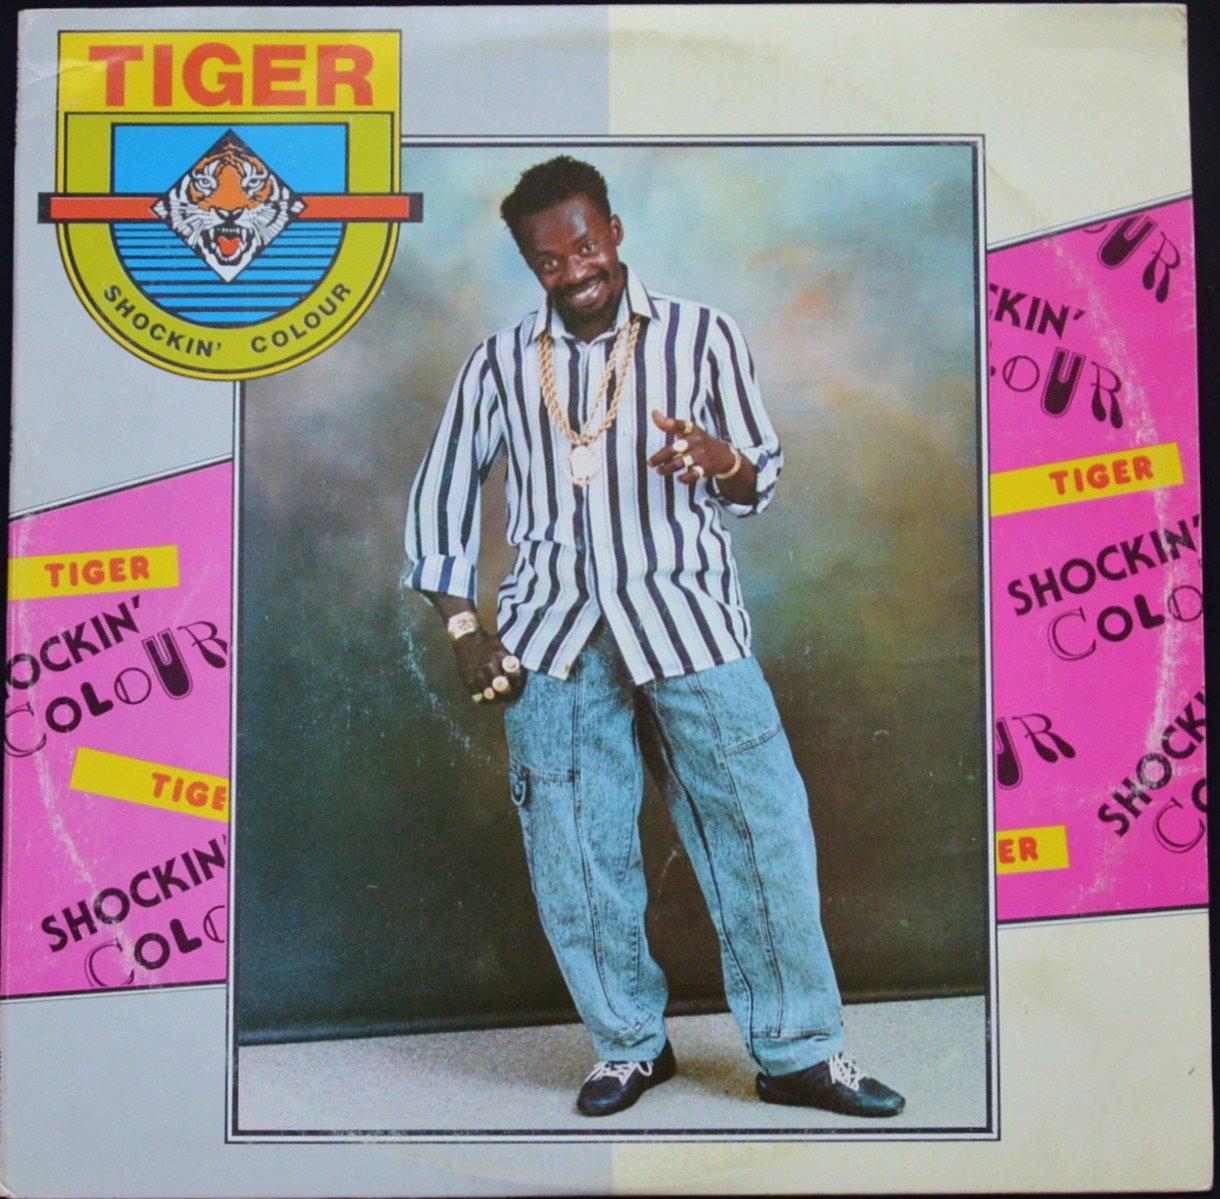 TIGER / SHOCKIN' COLOUR (1LP)